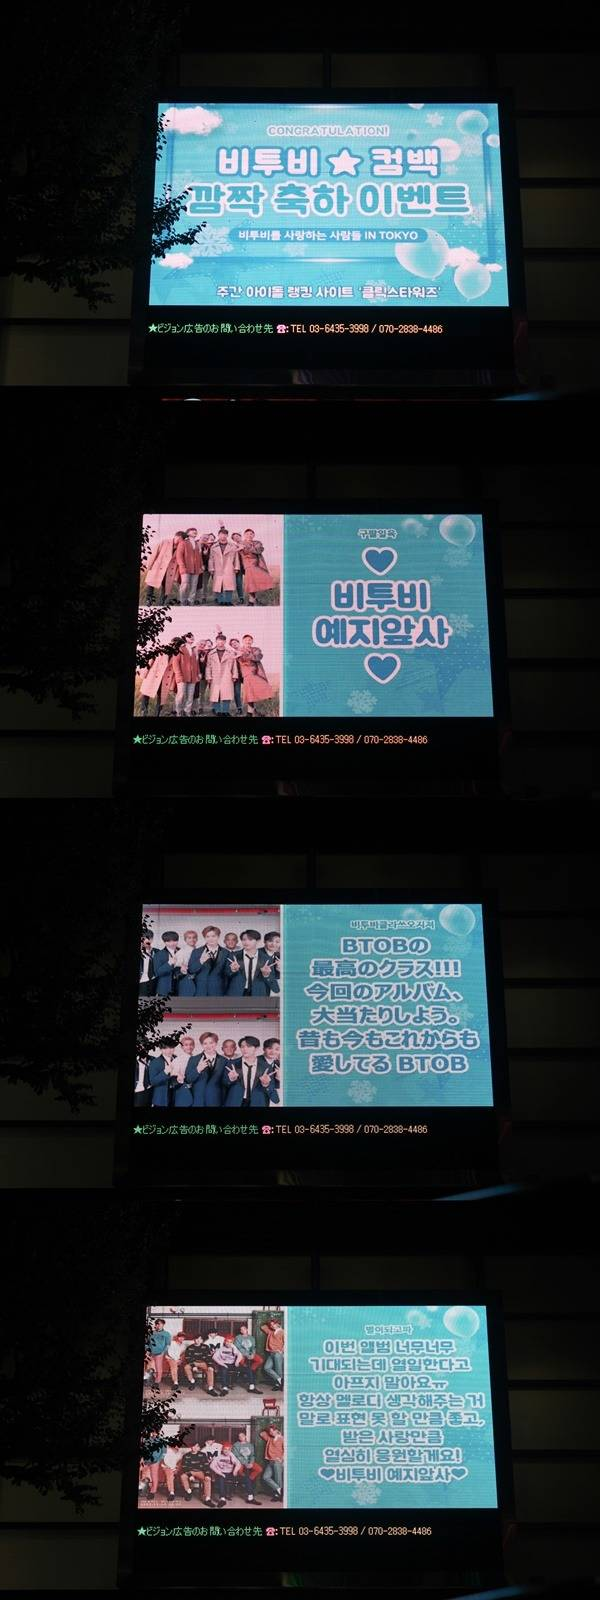 東京・新大久保電光掲示板で記念動画を上映。 写真:Click! StarWars